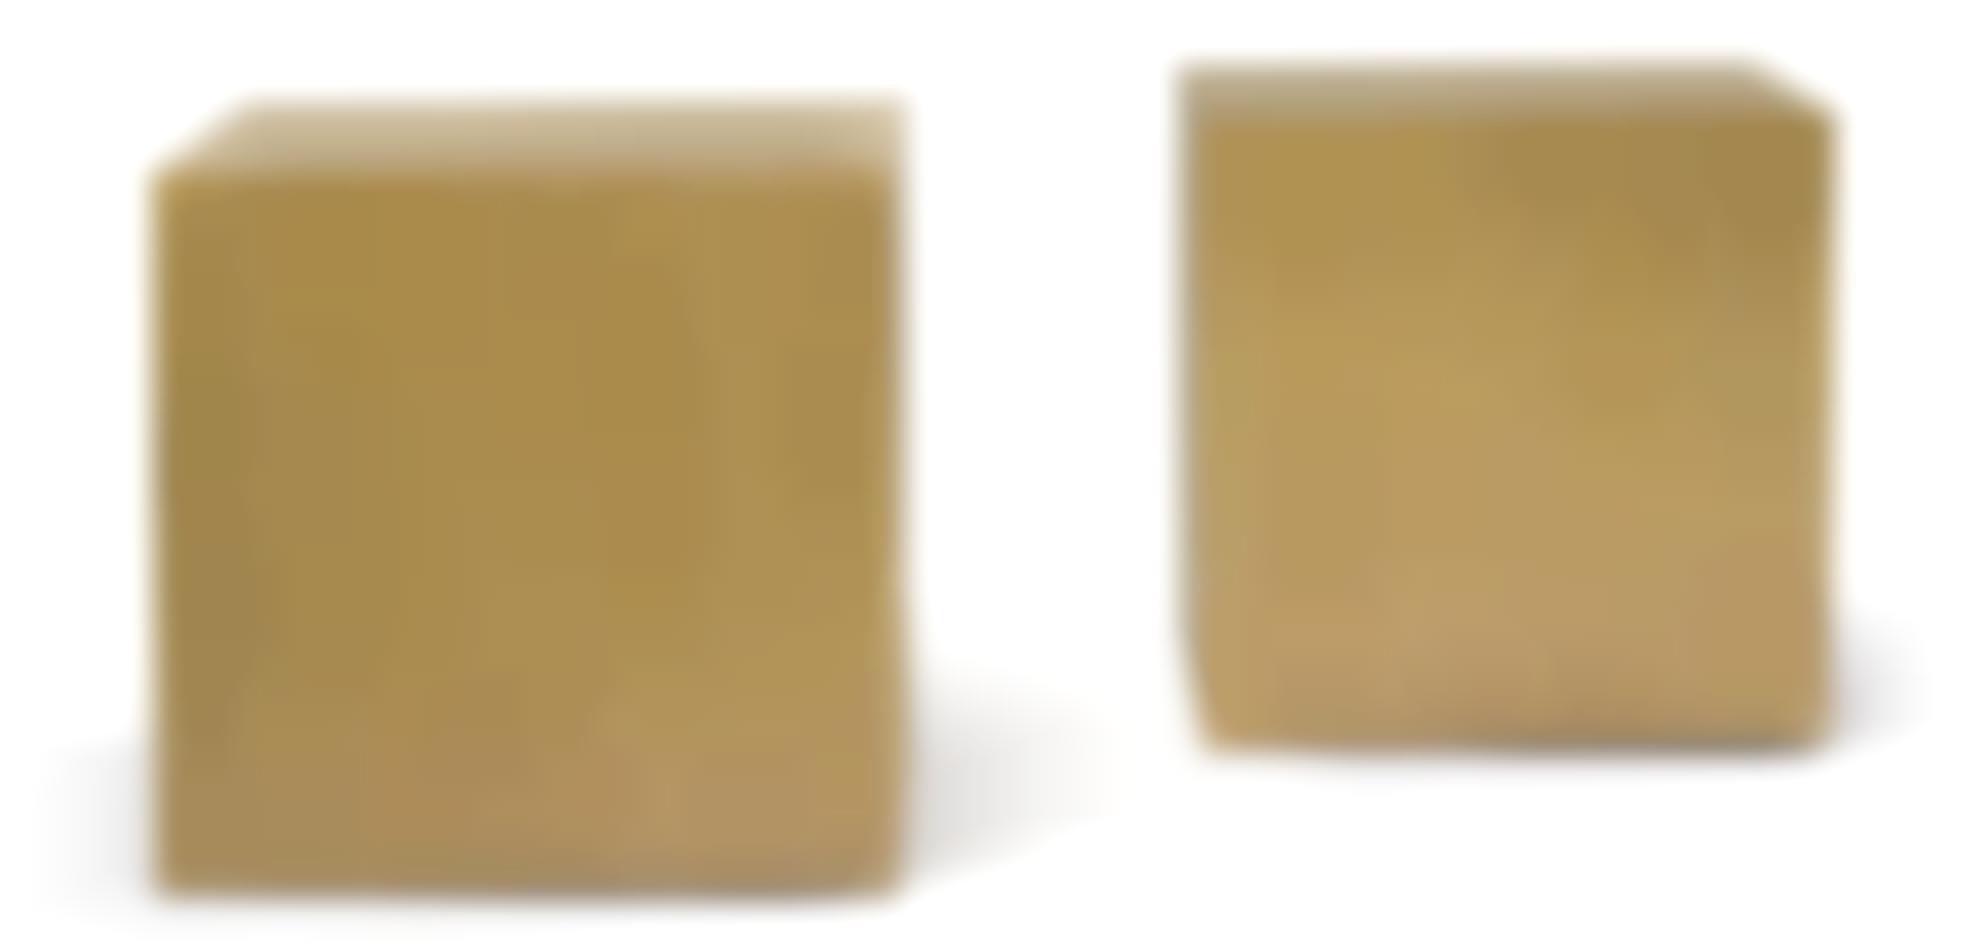 Scott Burton1939 - 1989 - A Unique Pair Of Cubes-1980